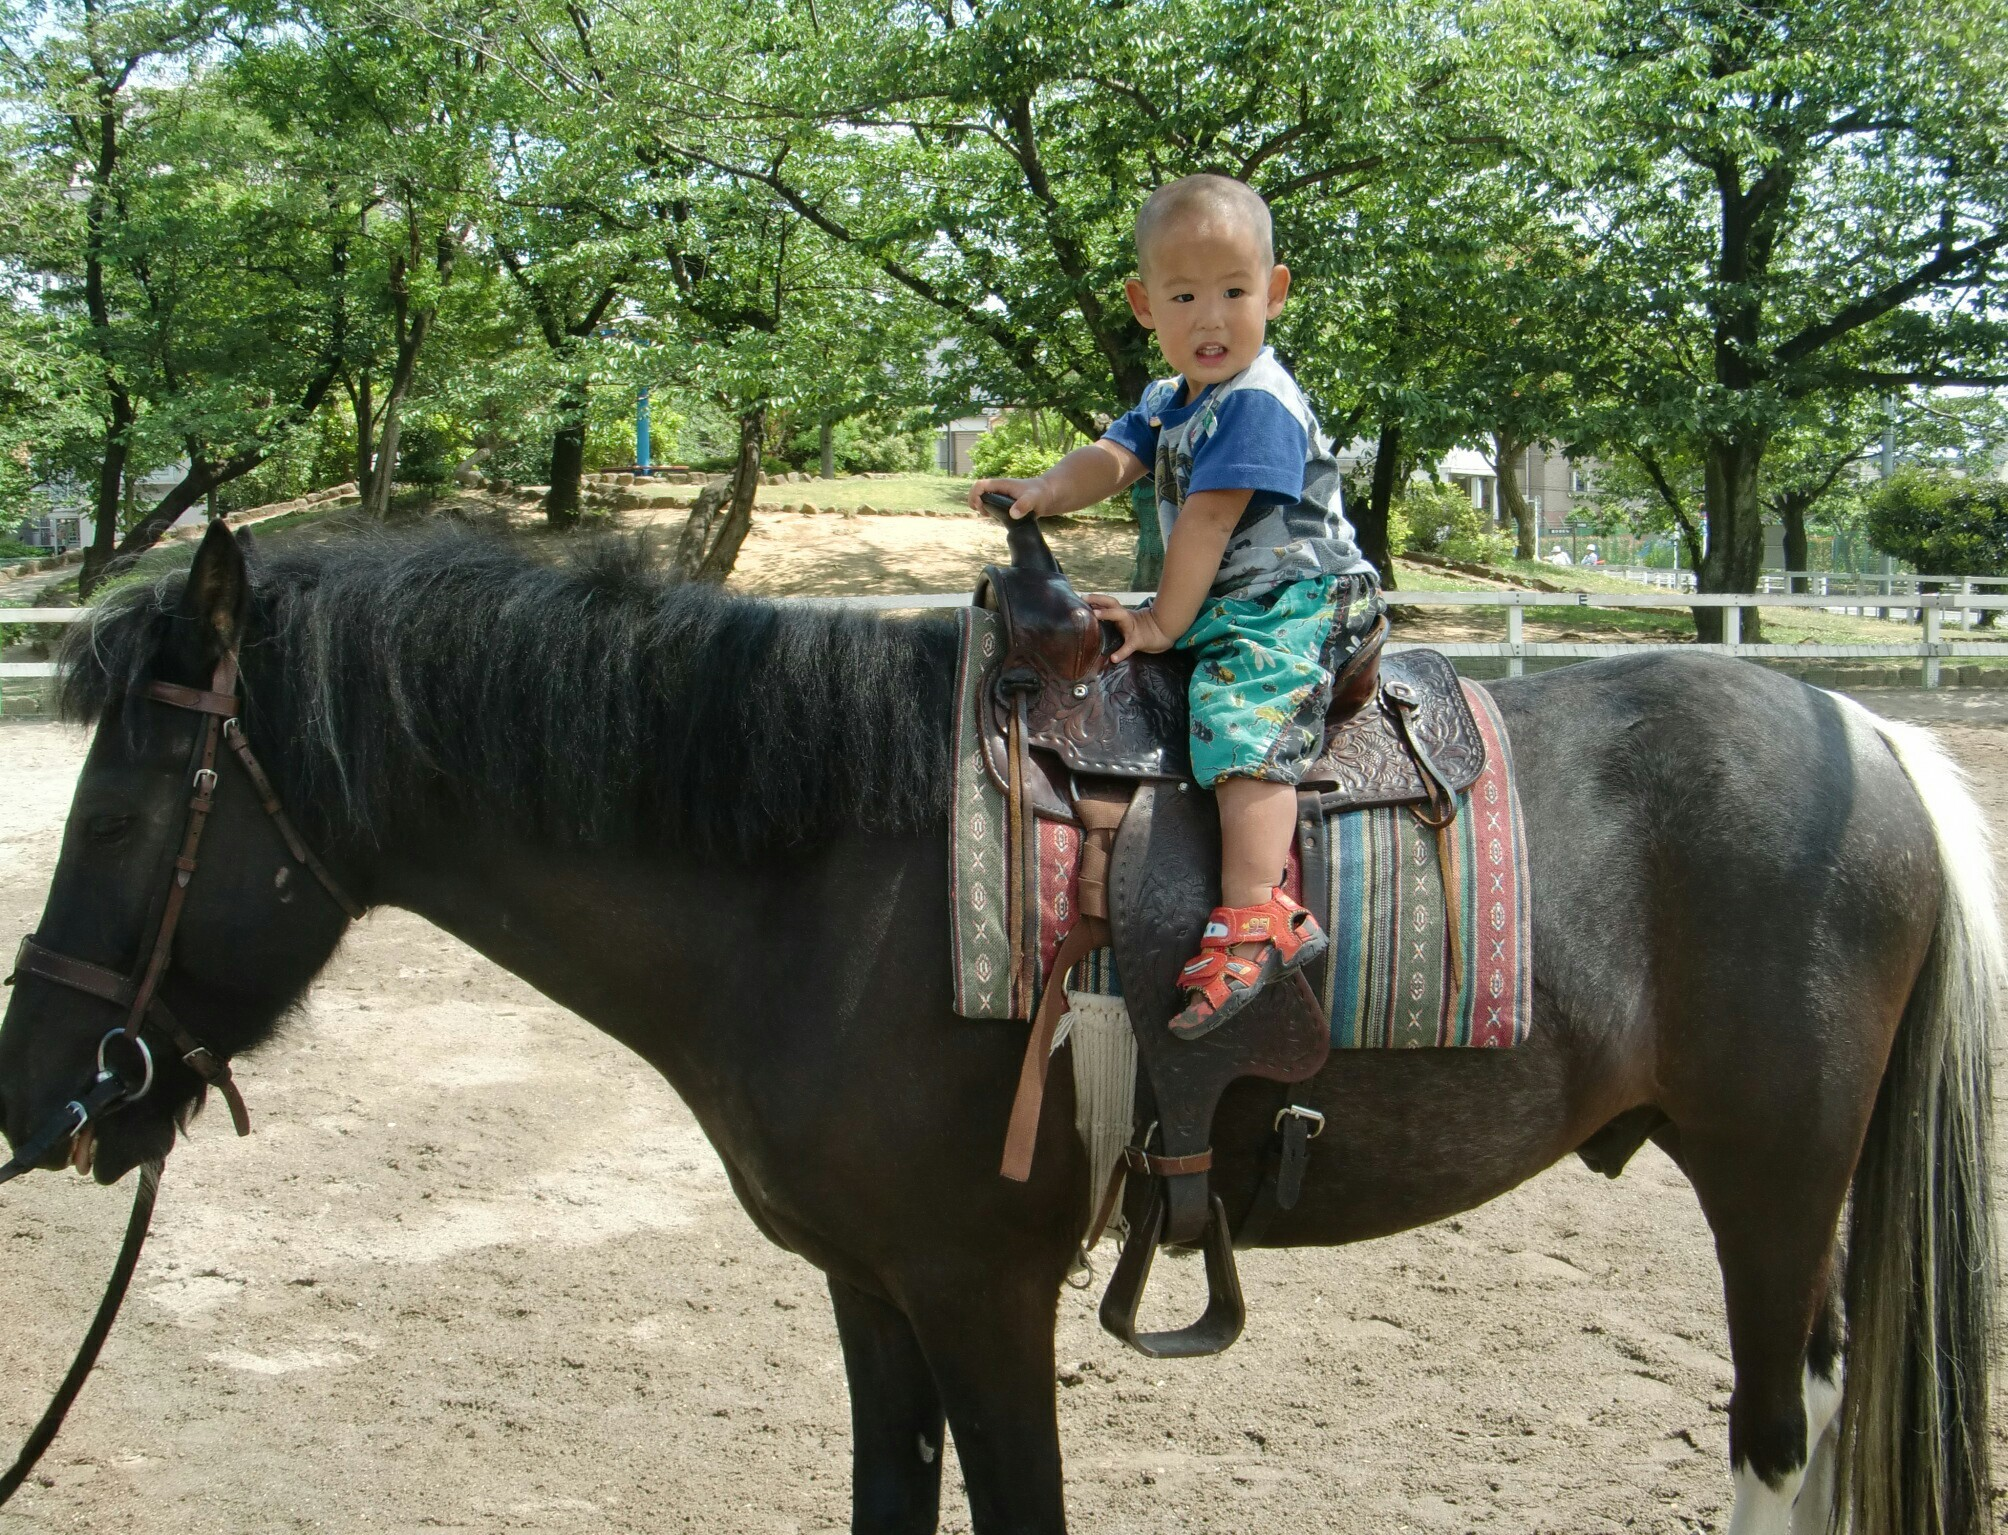 上千葉砂原公園 ポニー乗馬